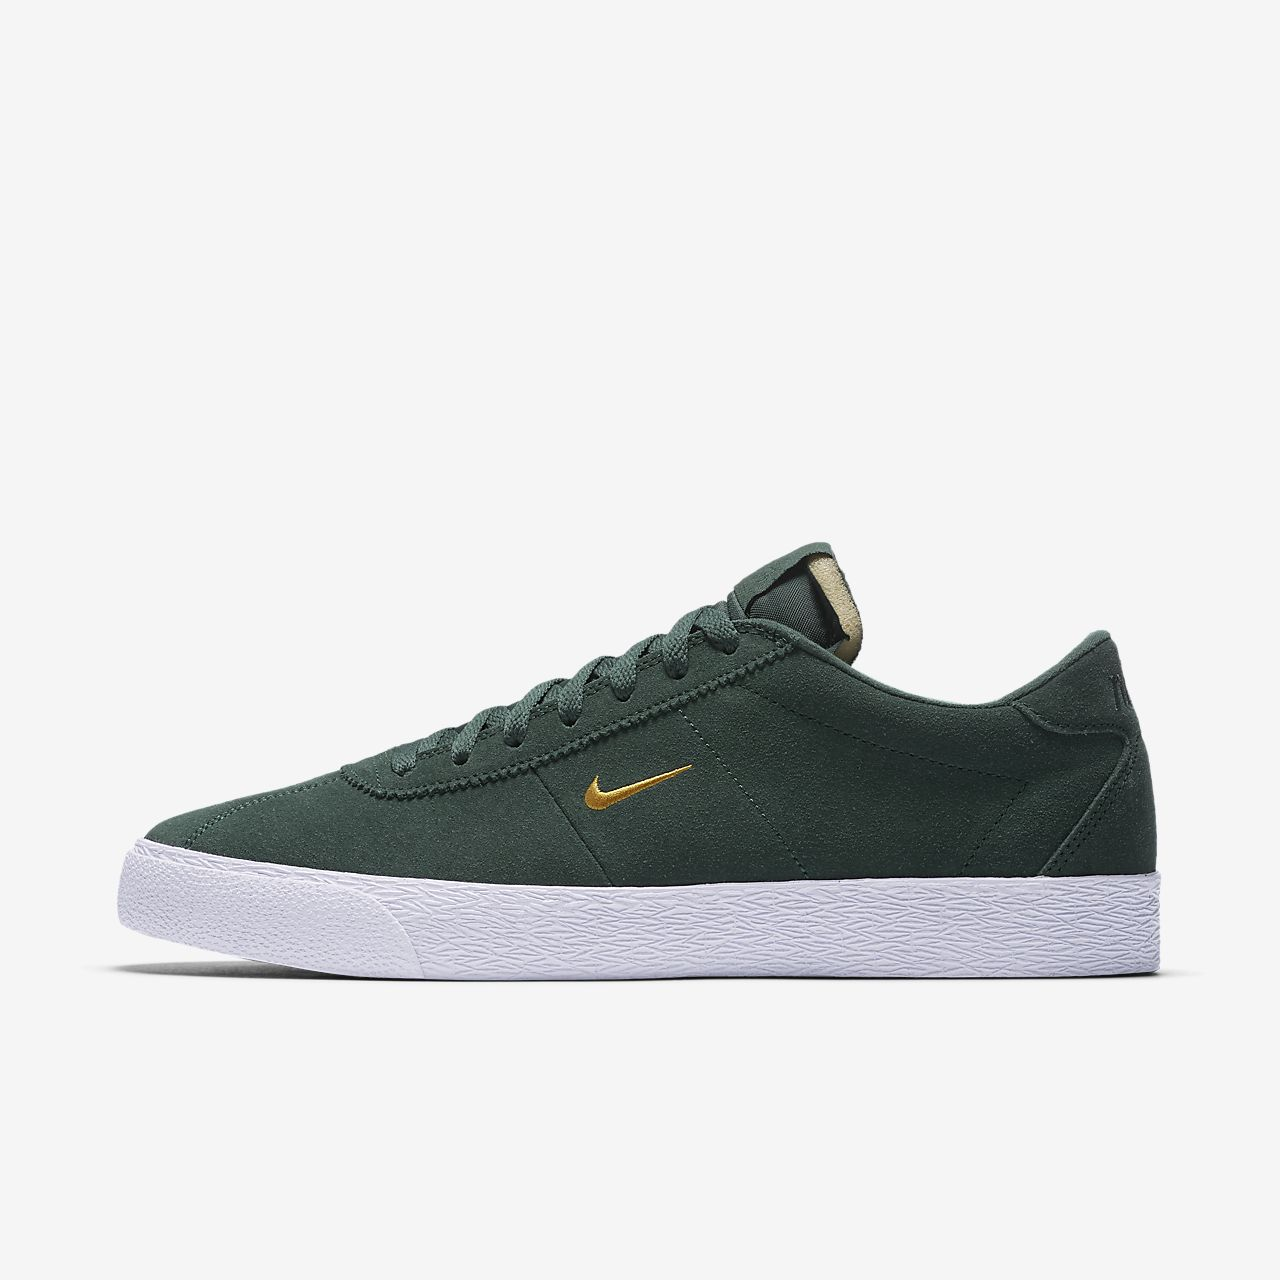 Nike SB Zoom Bruin Men's Skateboarding Shoe